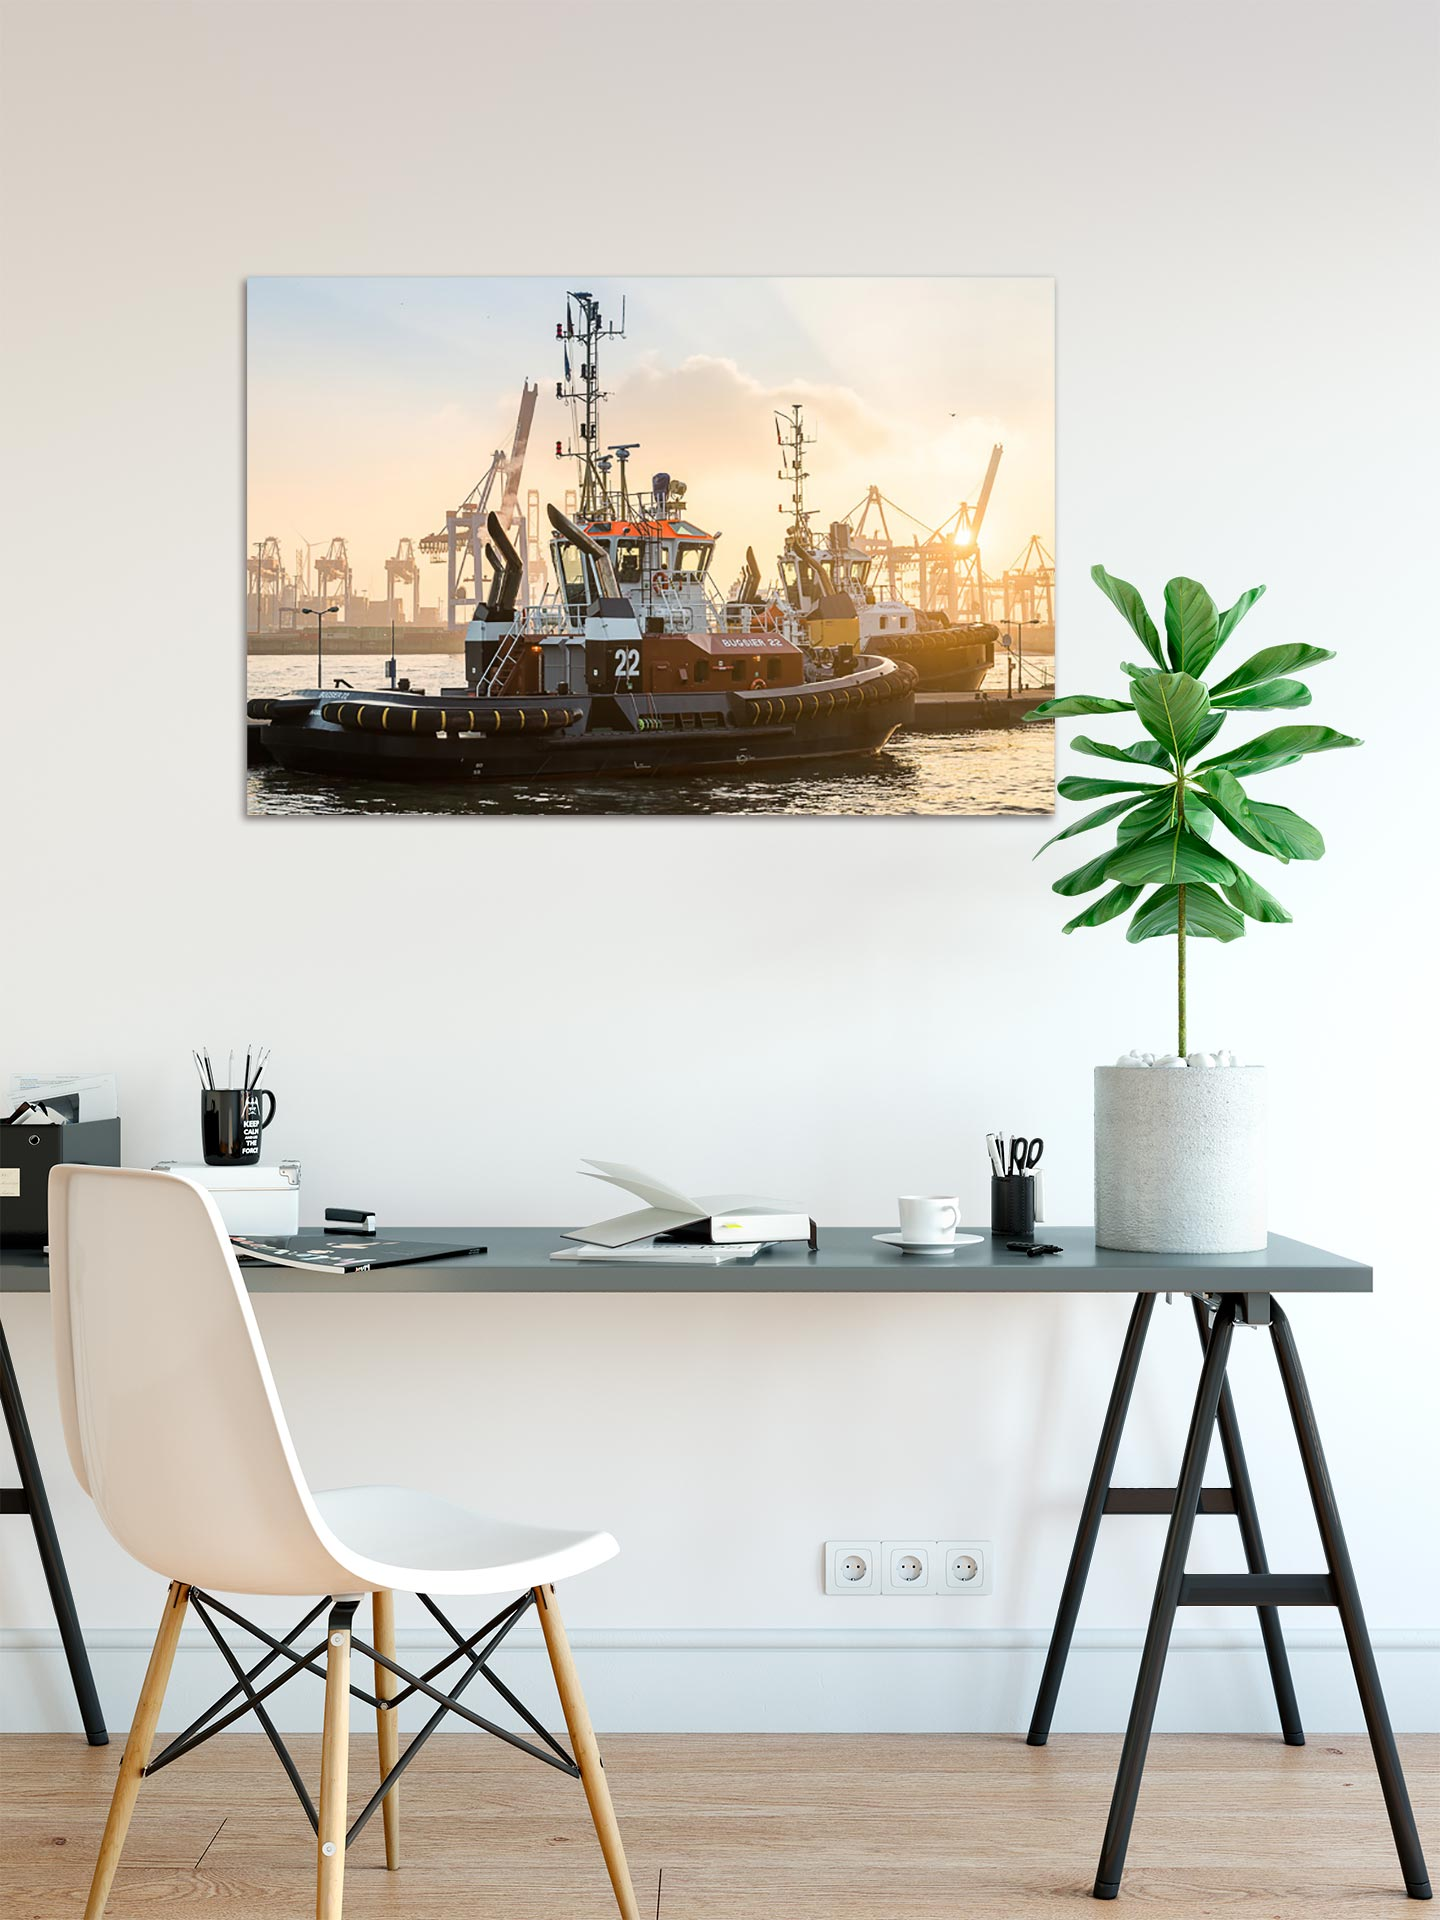 JS060-bugsier-22-wandbild-bild-auf-leinwand-acrylglas-aludibond-arbeitszimmer